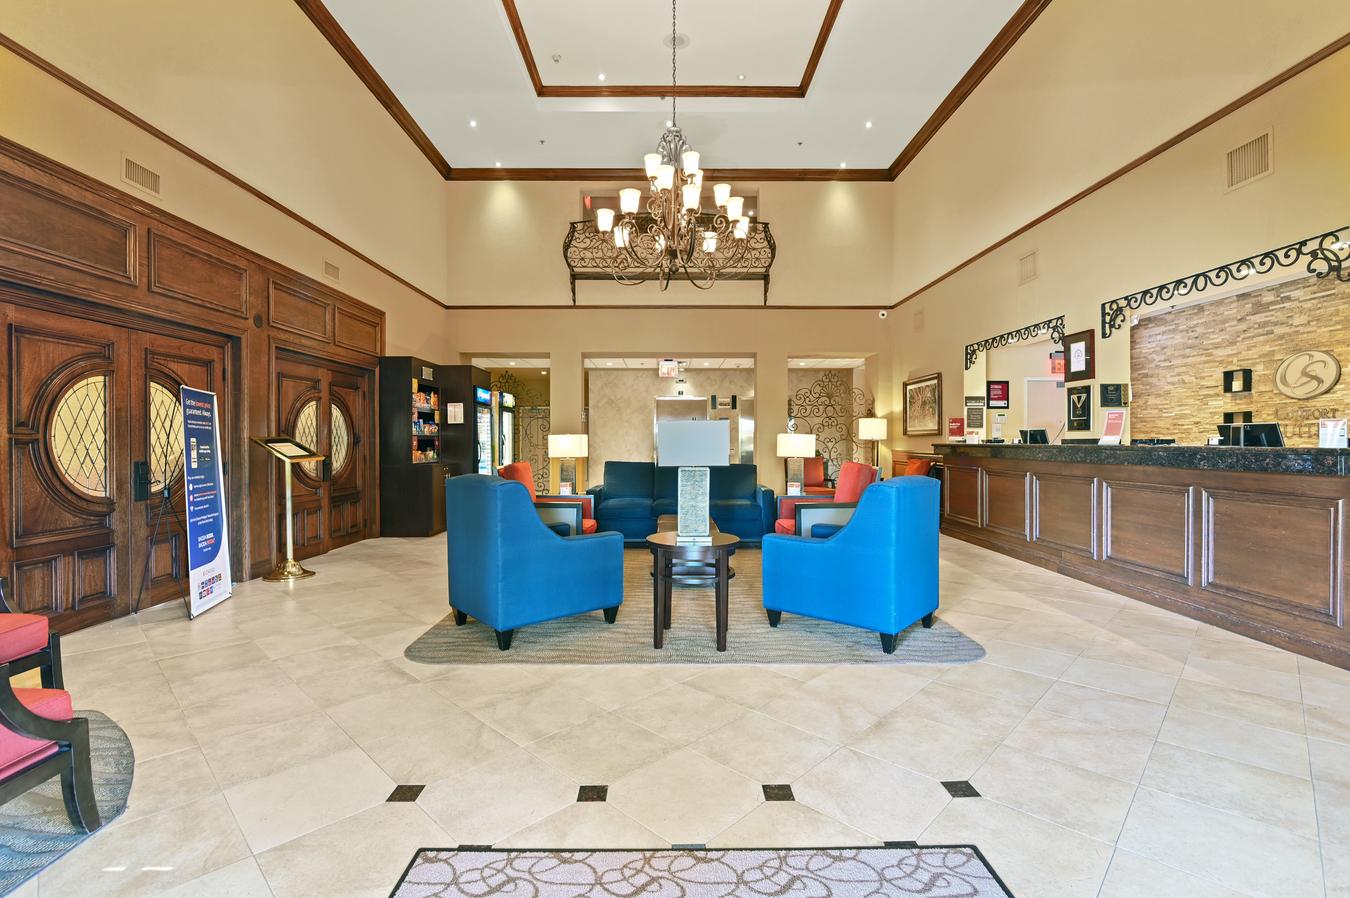 Slider Image - Reception area